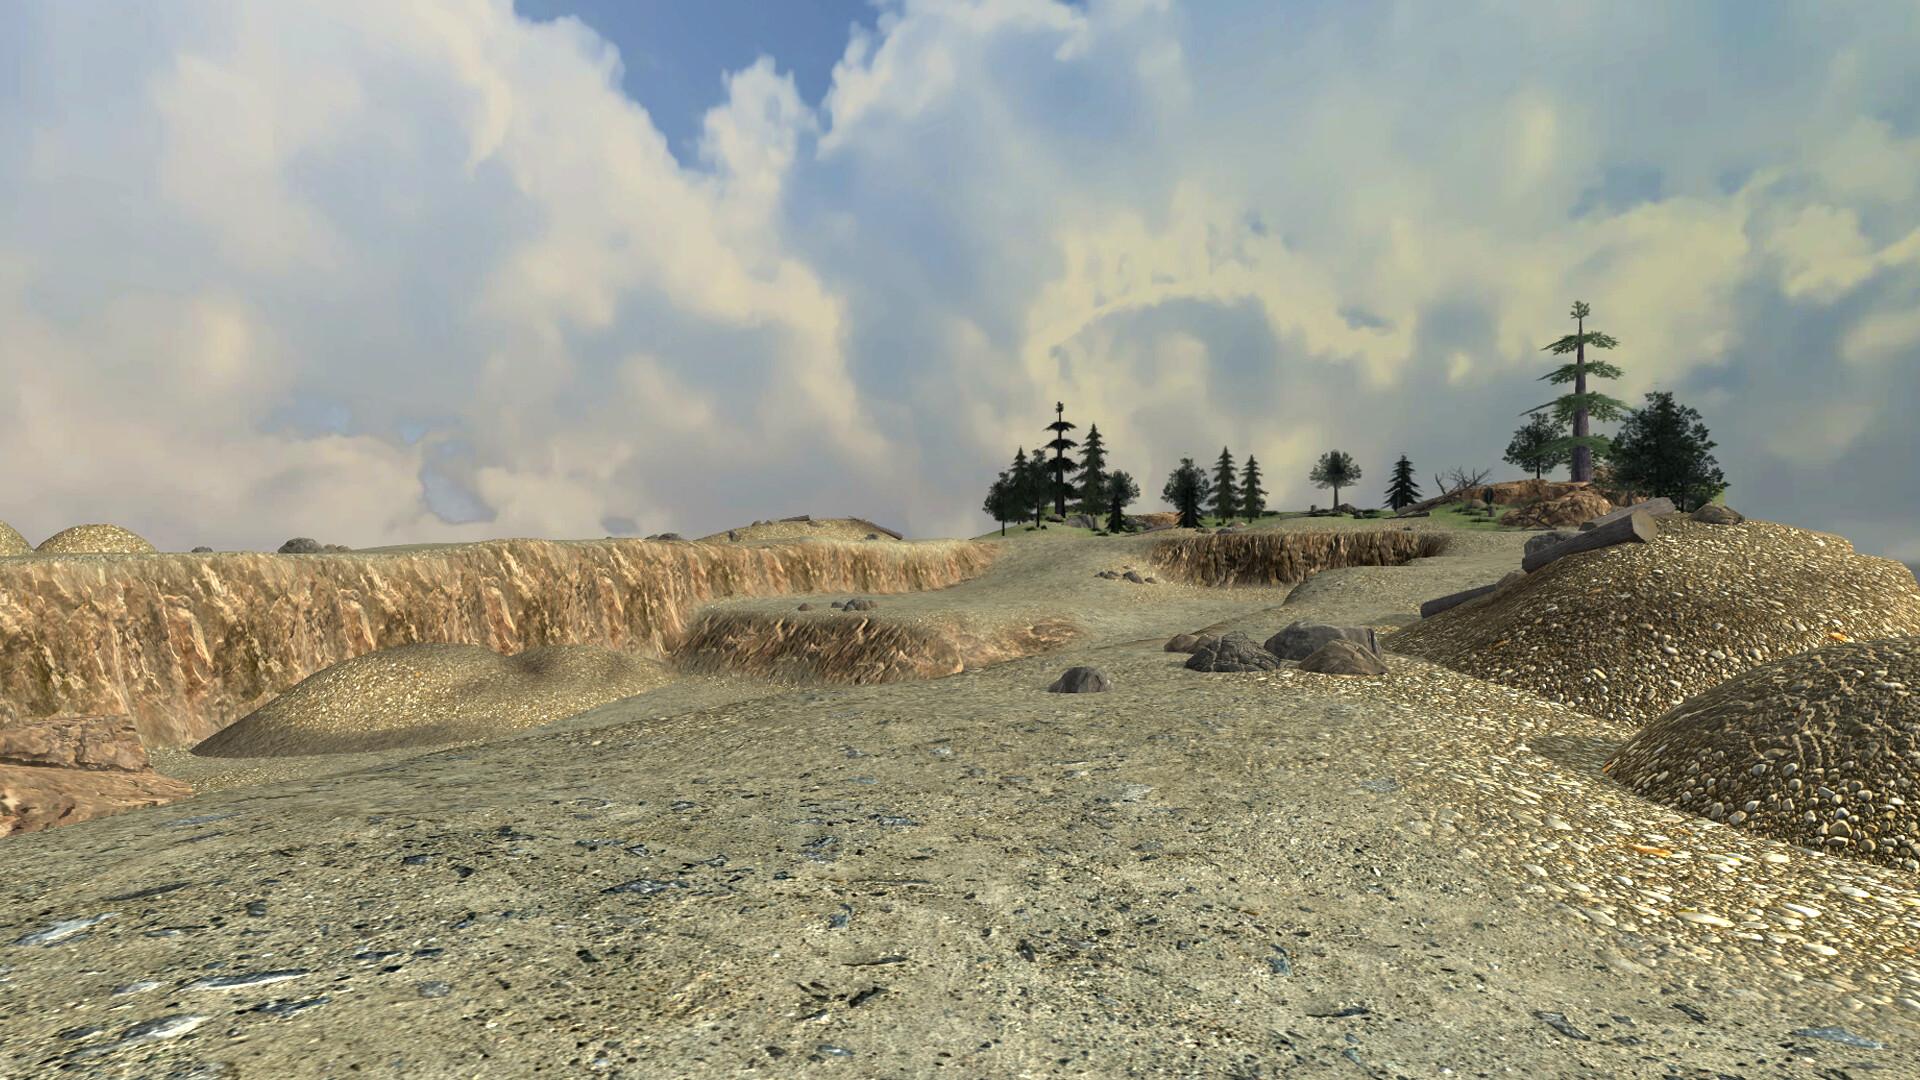 Jordan cameron quarry 21